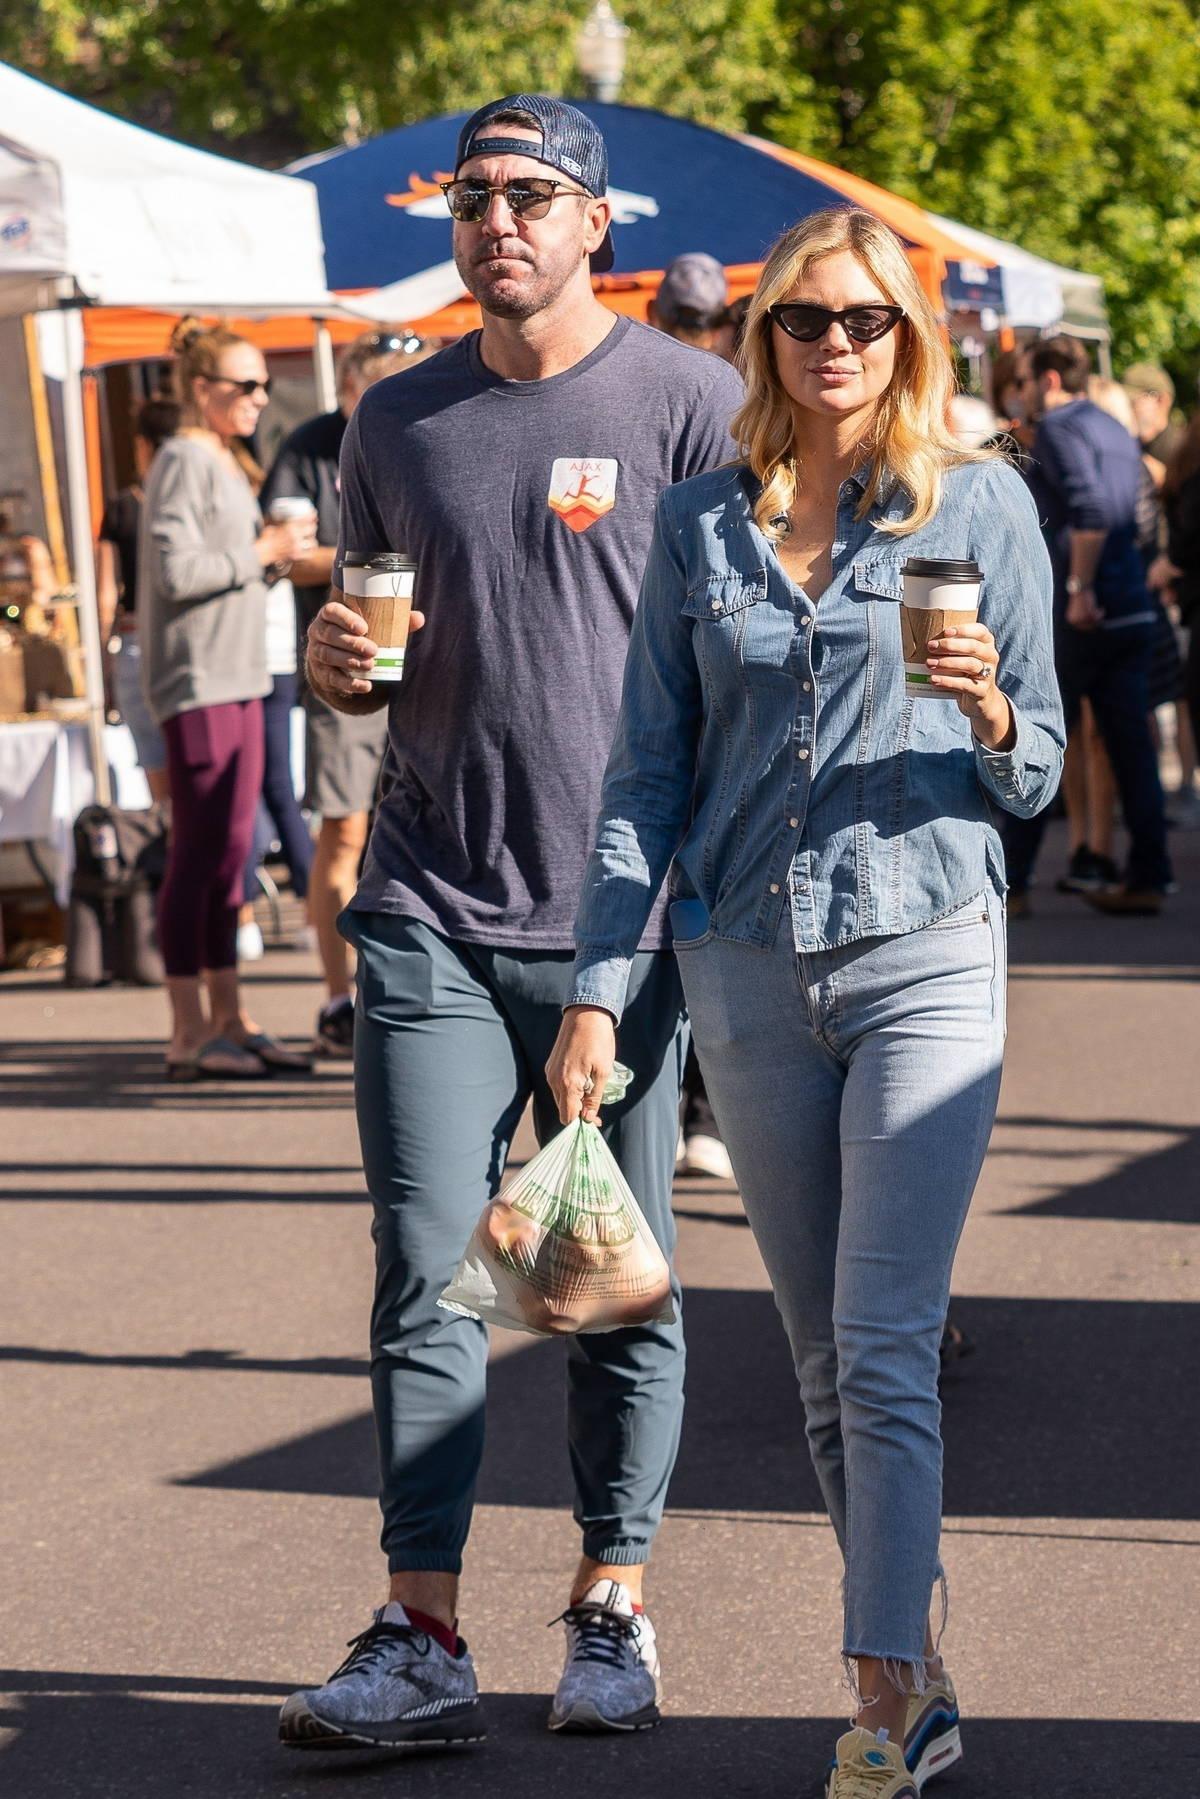 Kate Upton and Justin Verlander enjoy a stroll through the market in Aspen, Colorado